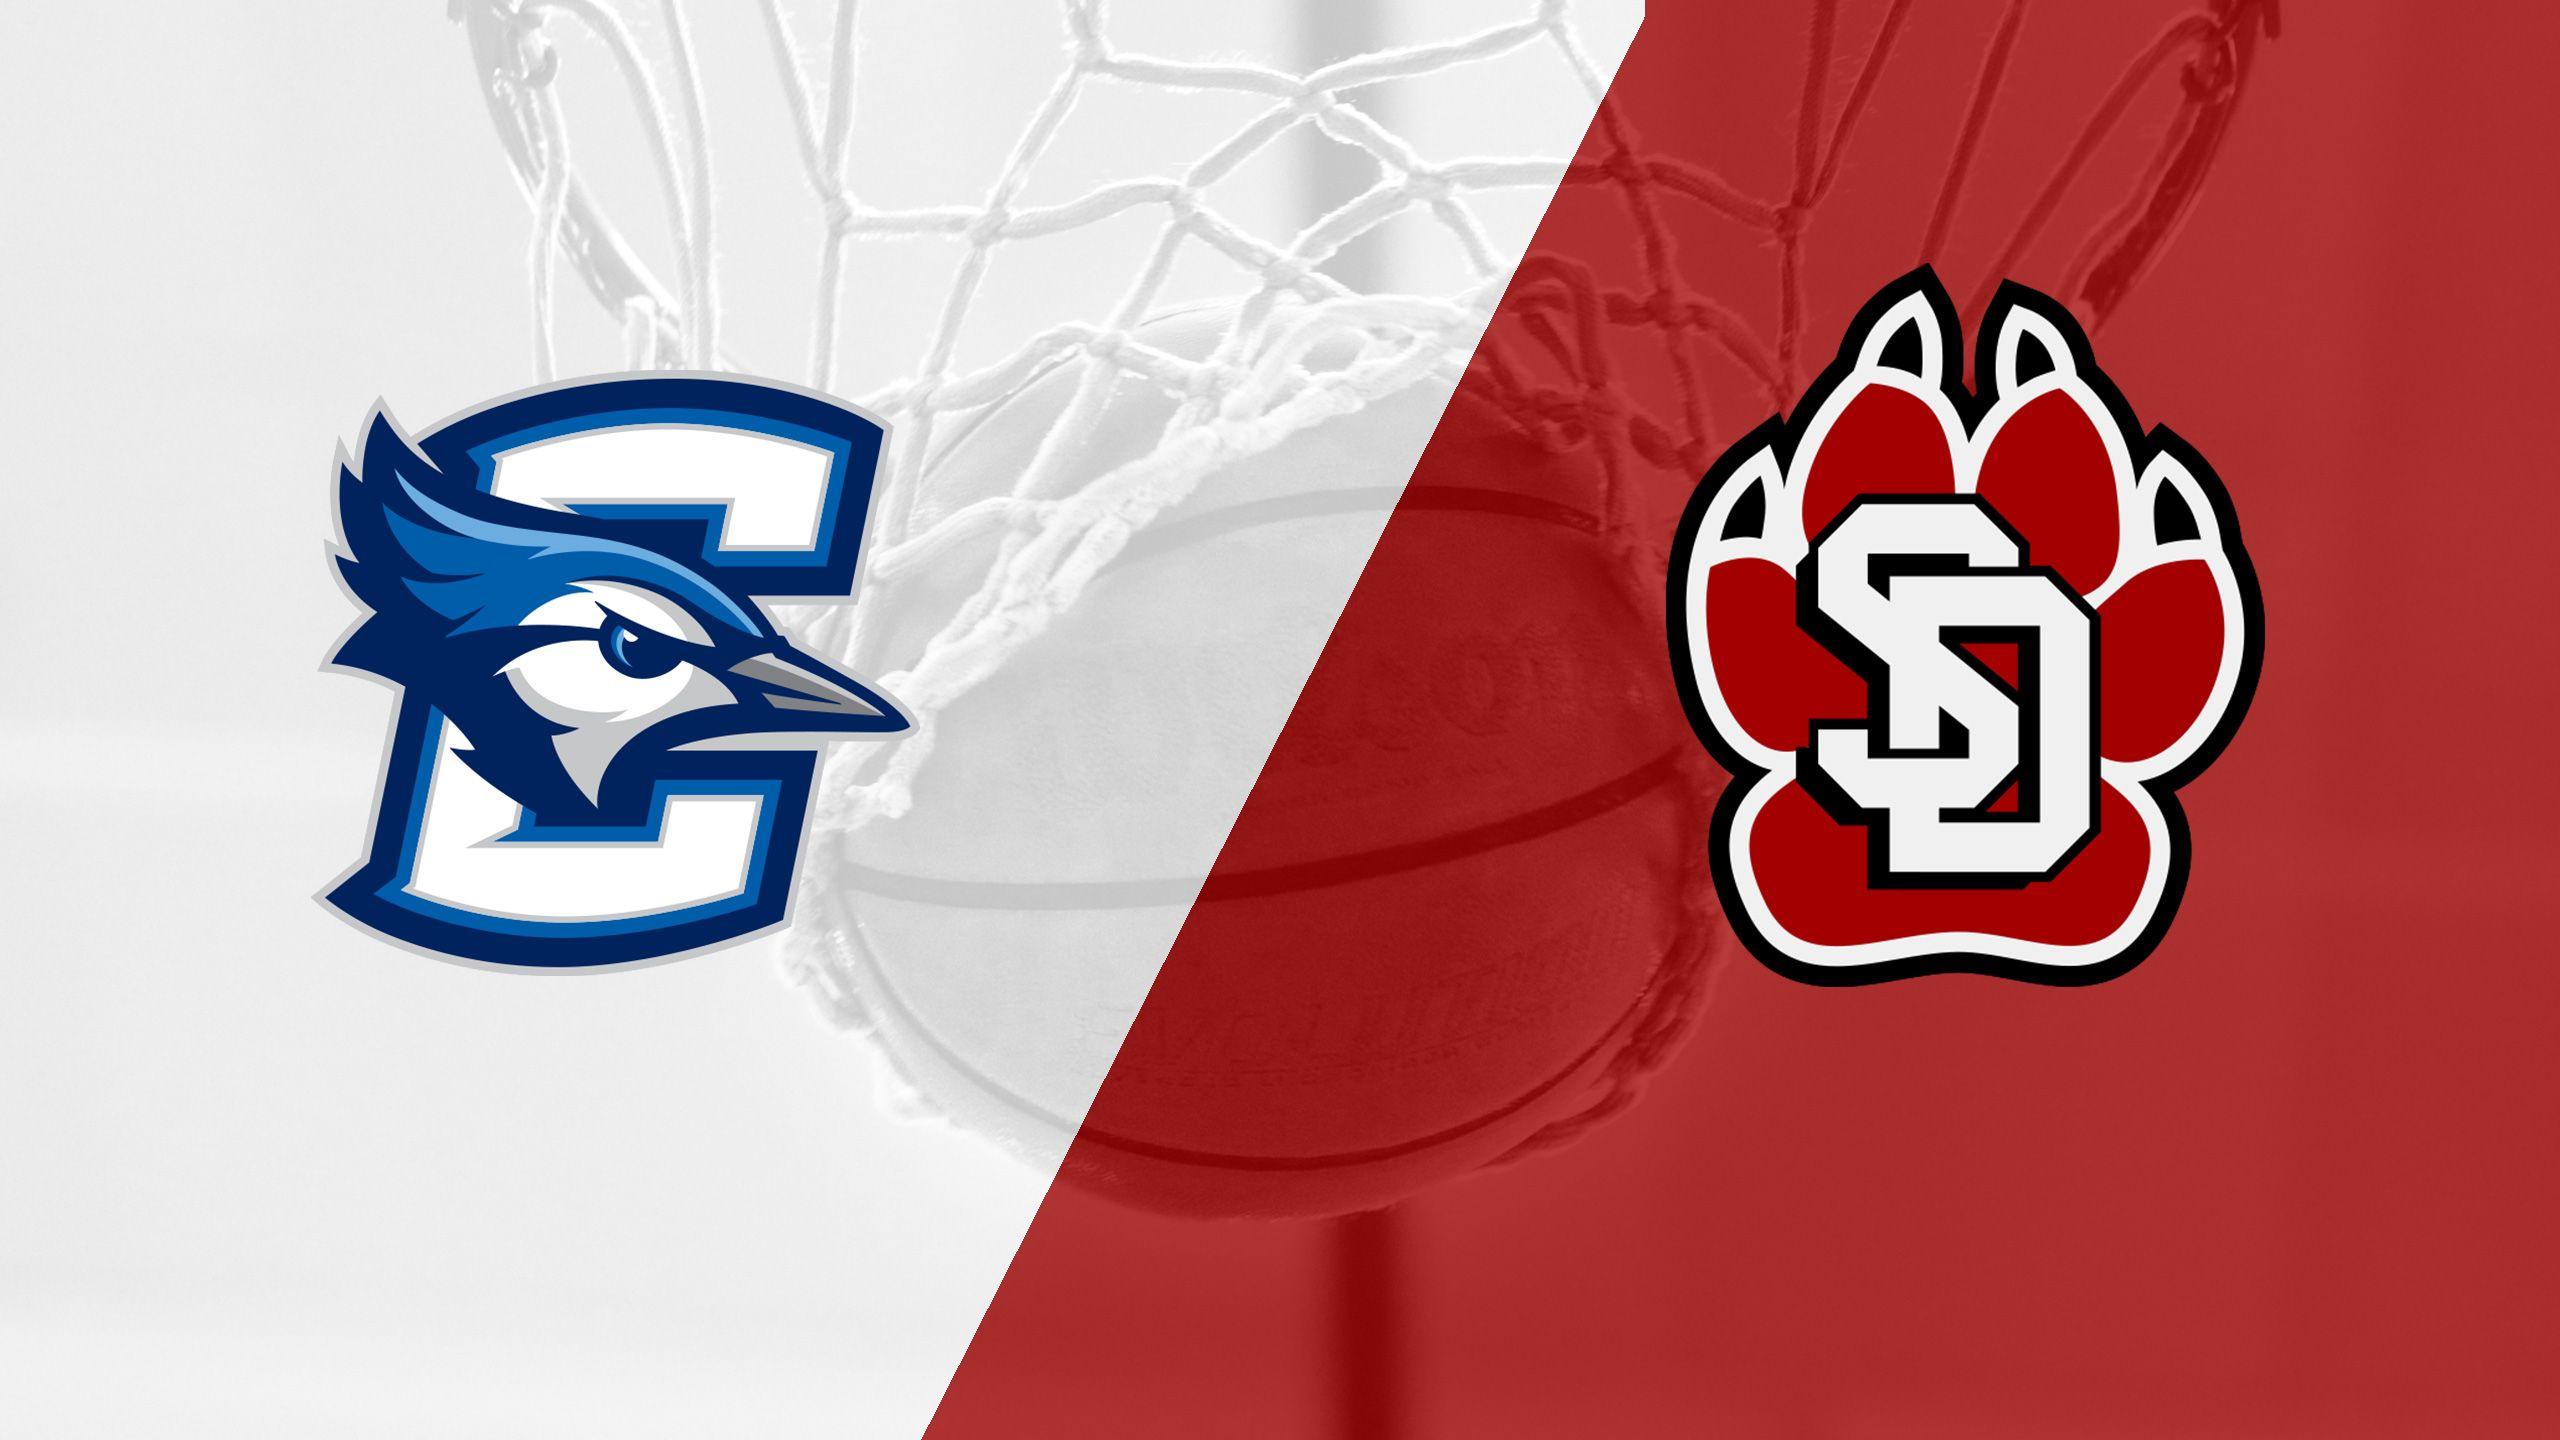 Creighton vs. South Dakota (W Basketball)